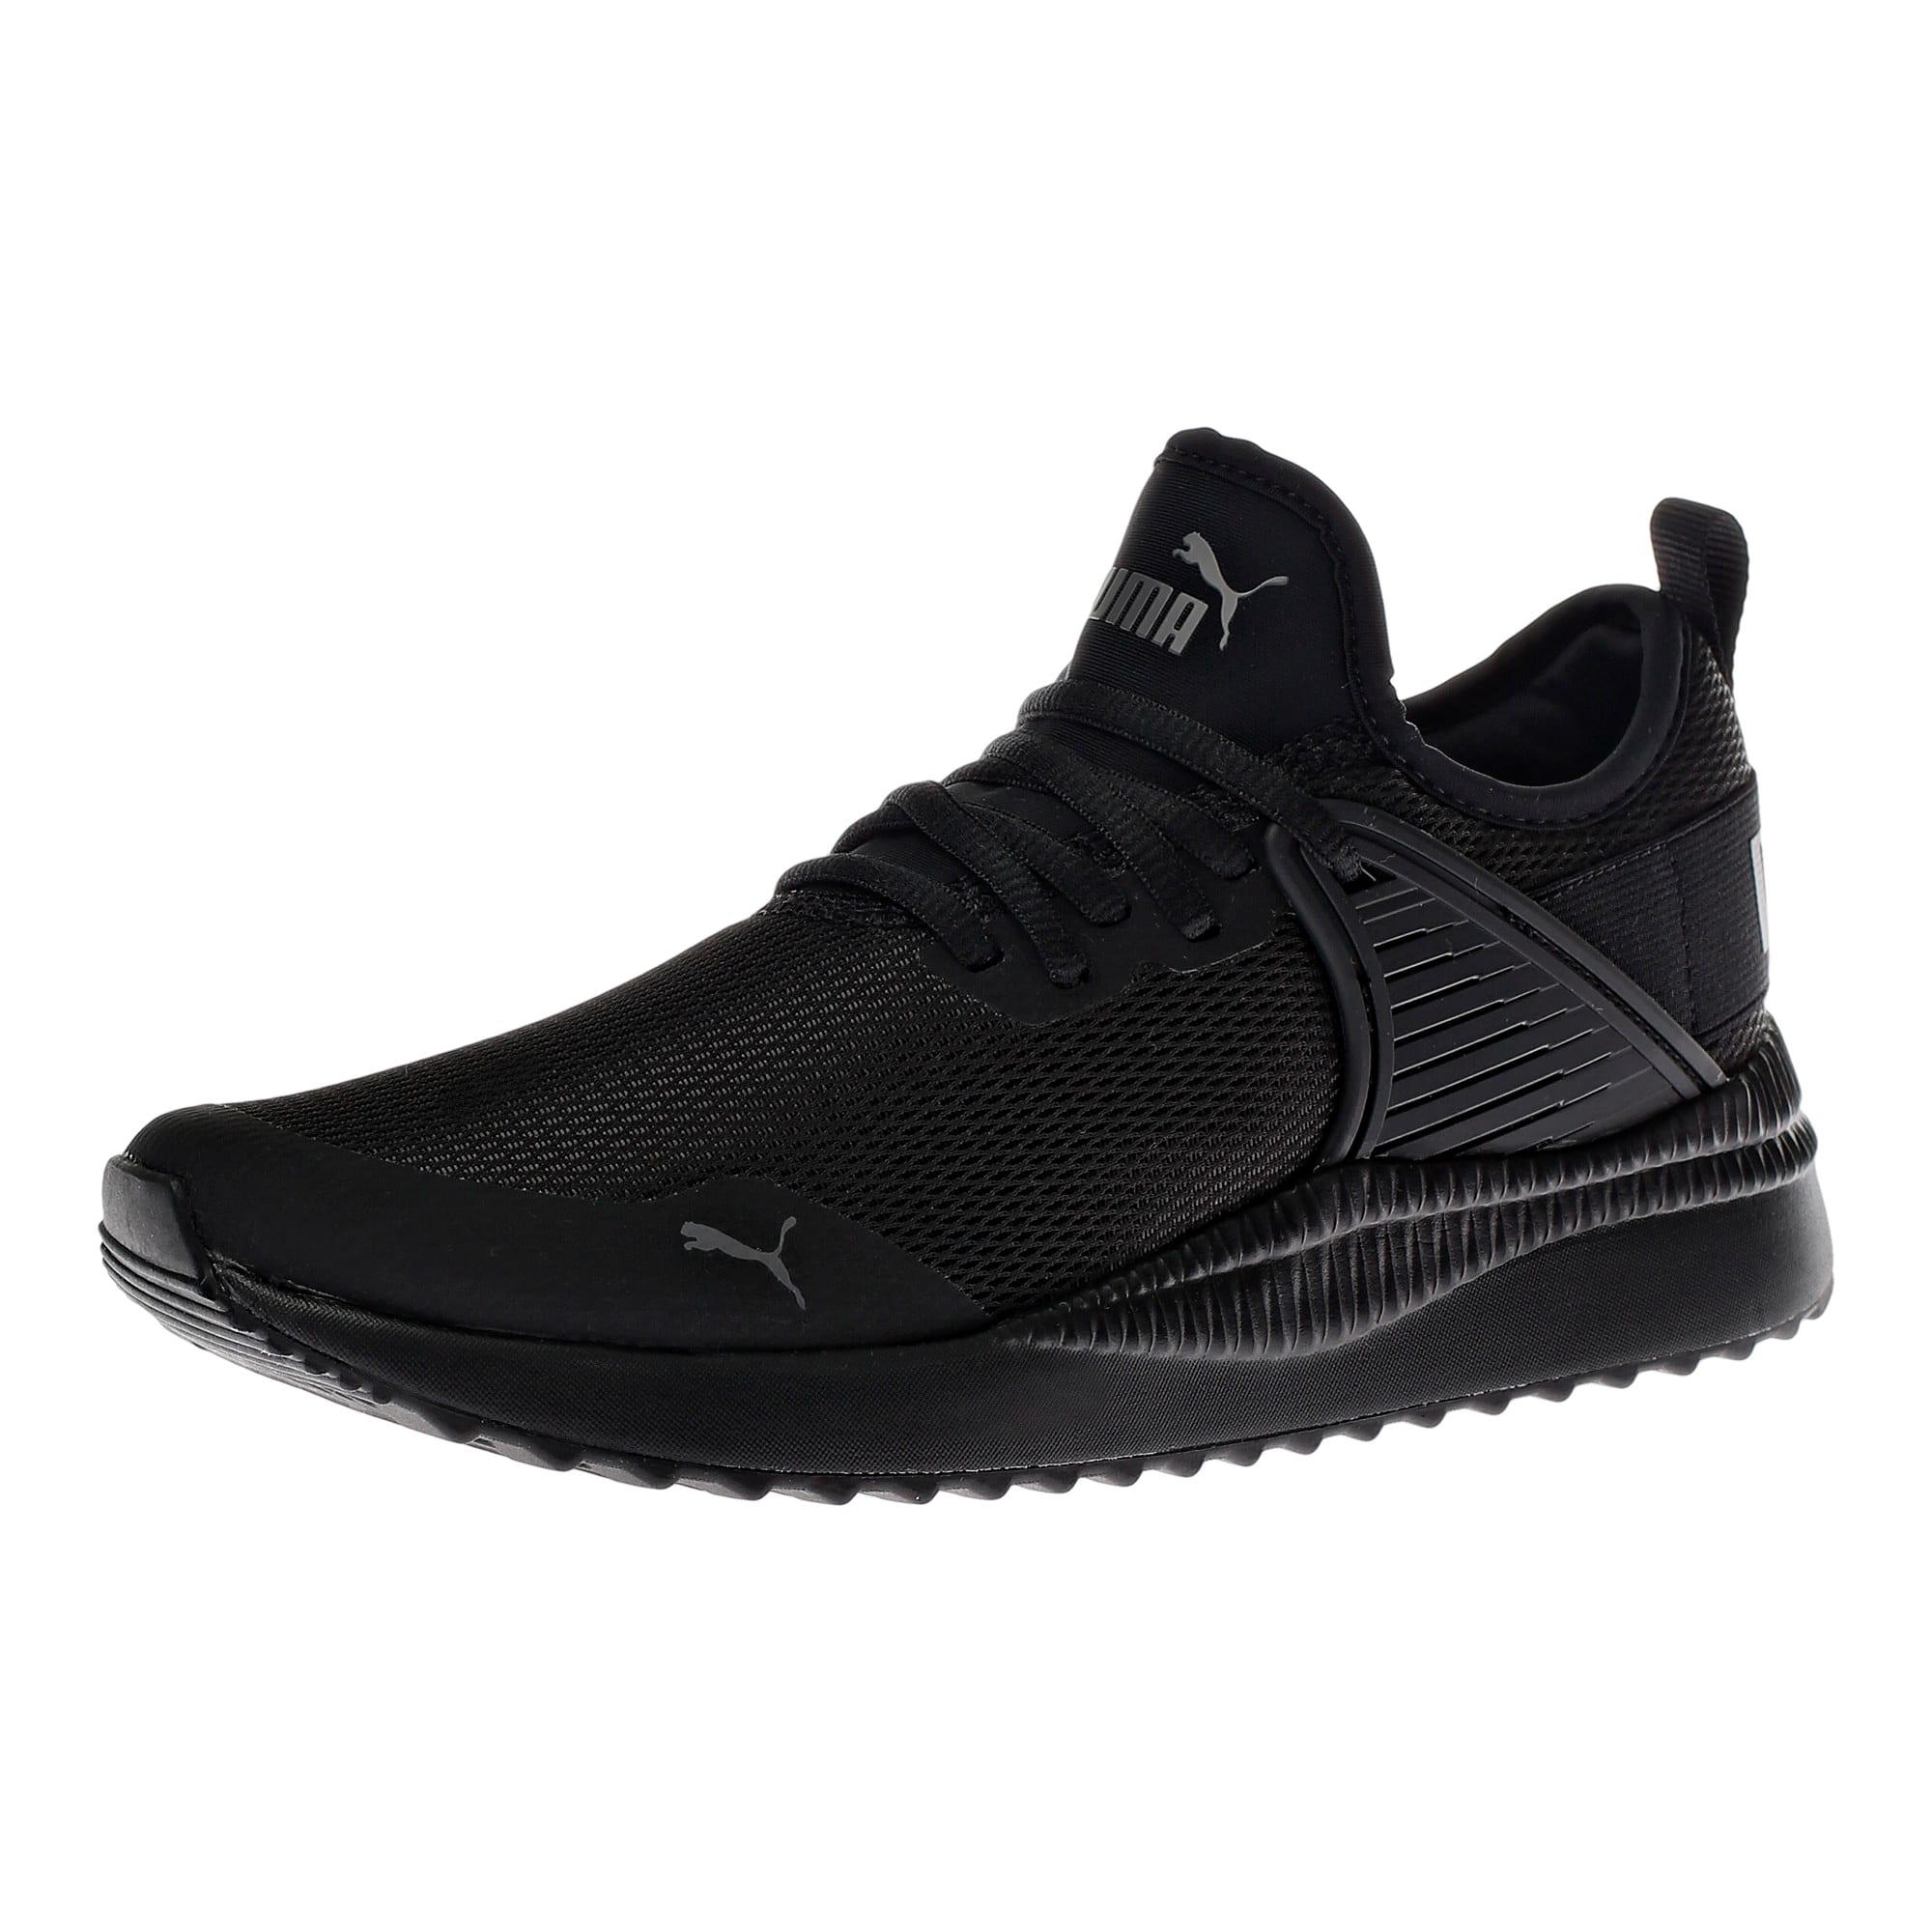 Thumbnail 1 of Pacer Next Cage Sneakers JR, Puma Black-Puma Black, medium